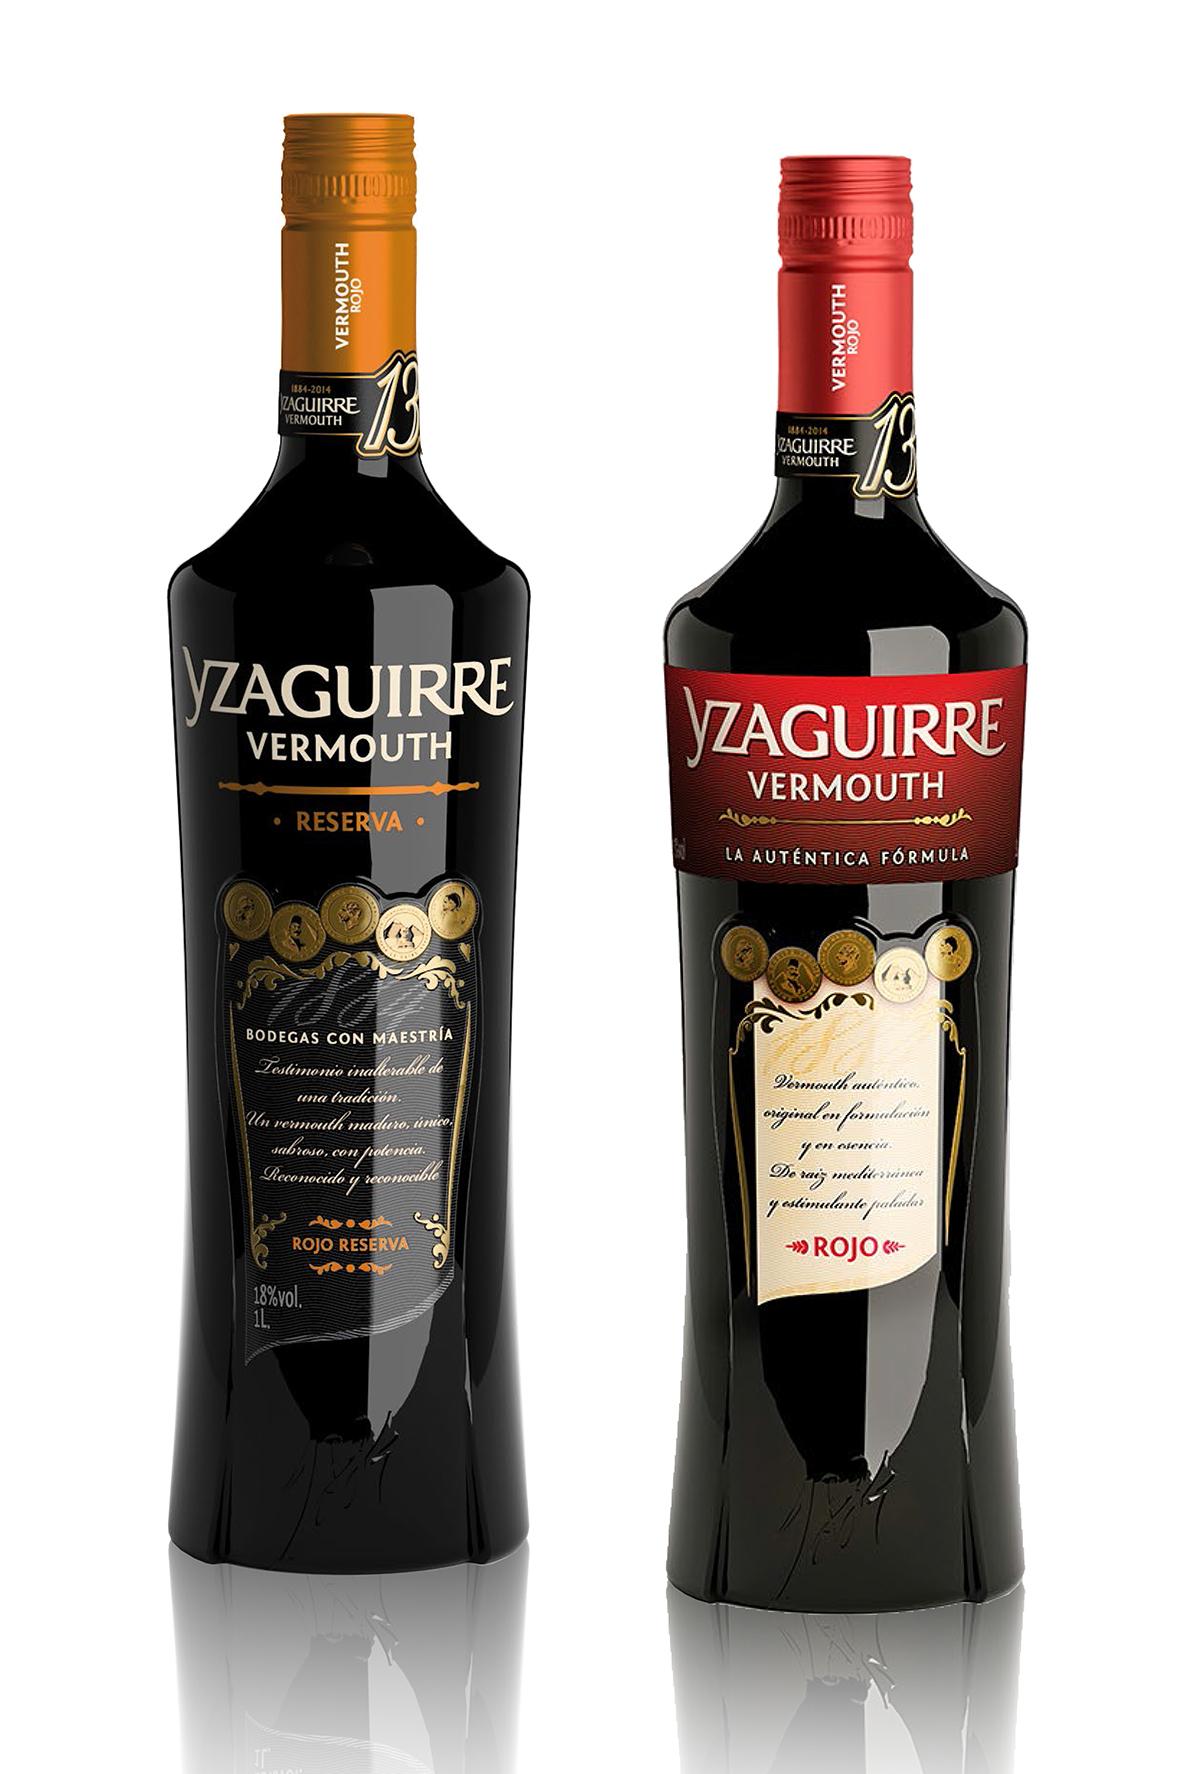 Yzaguirre - Vermouth Reserva et Rojo